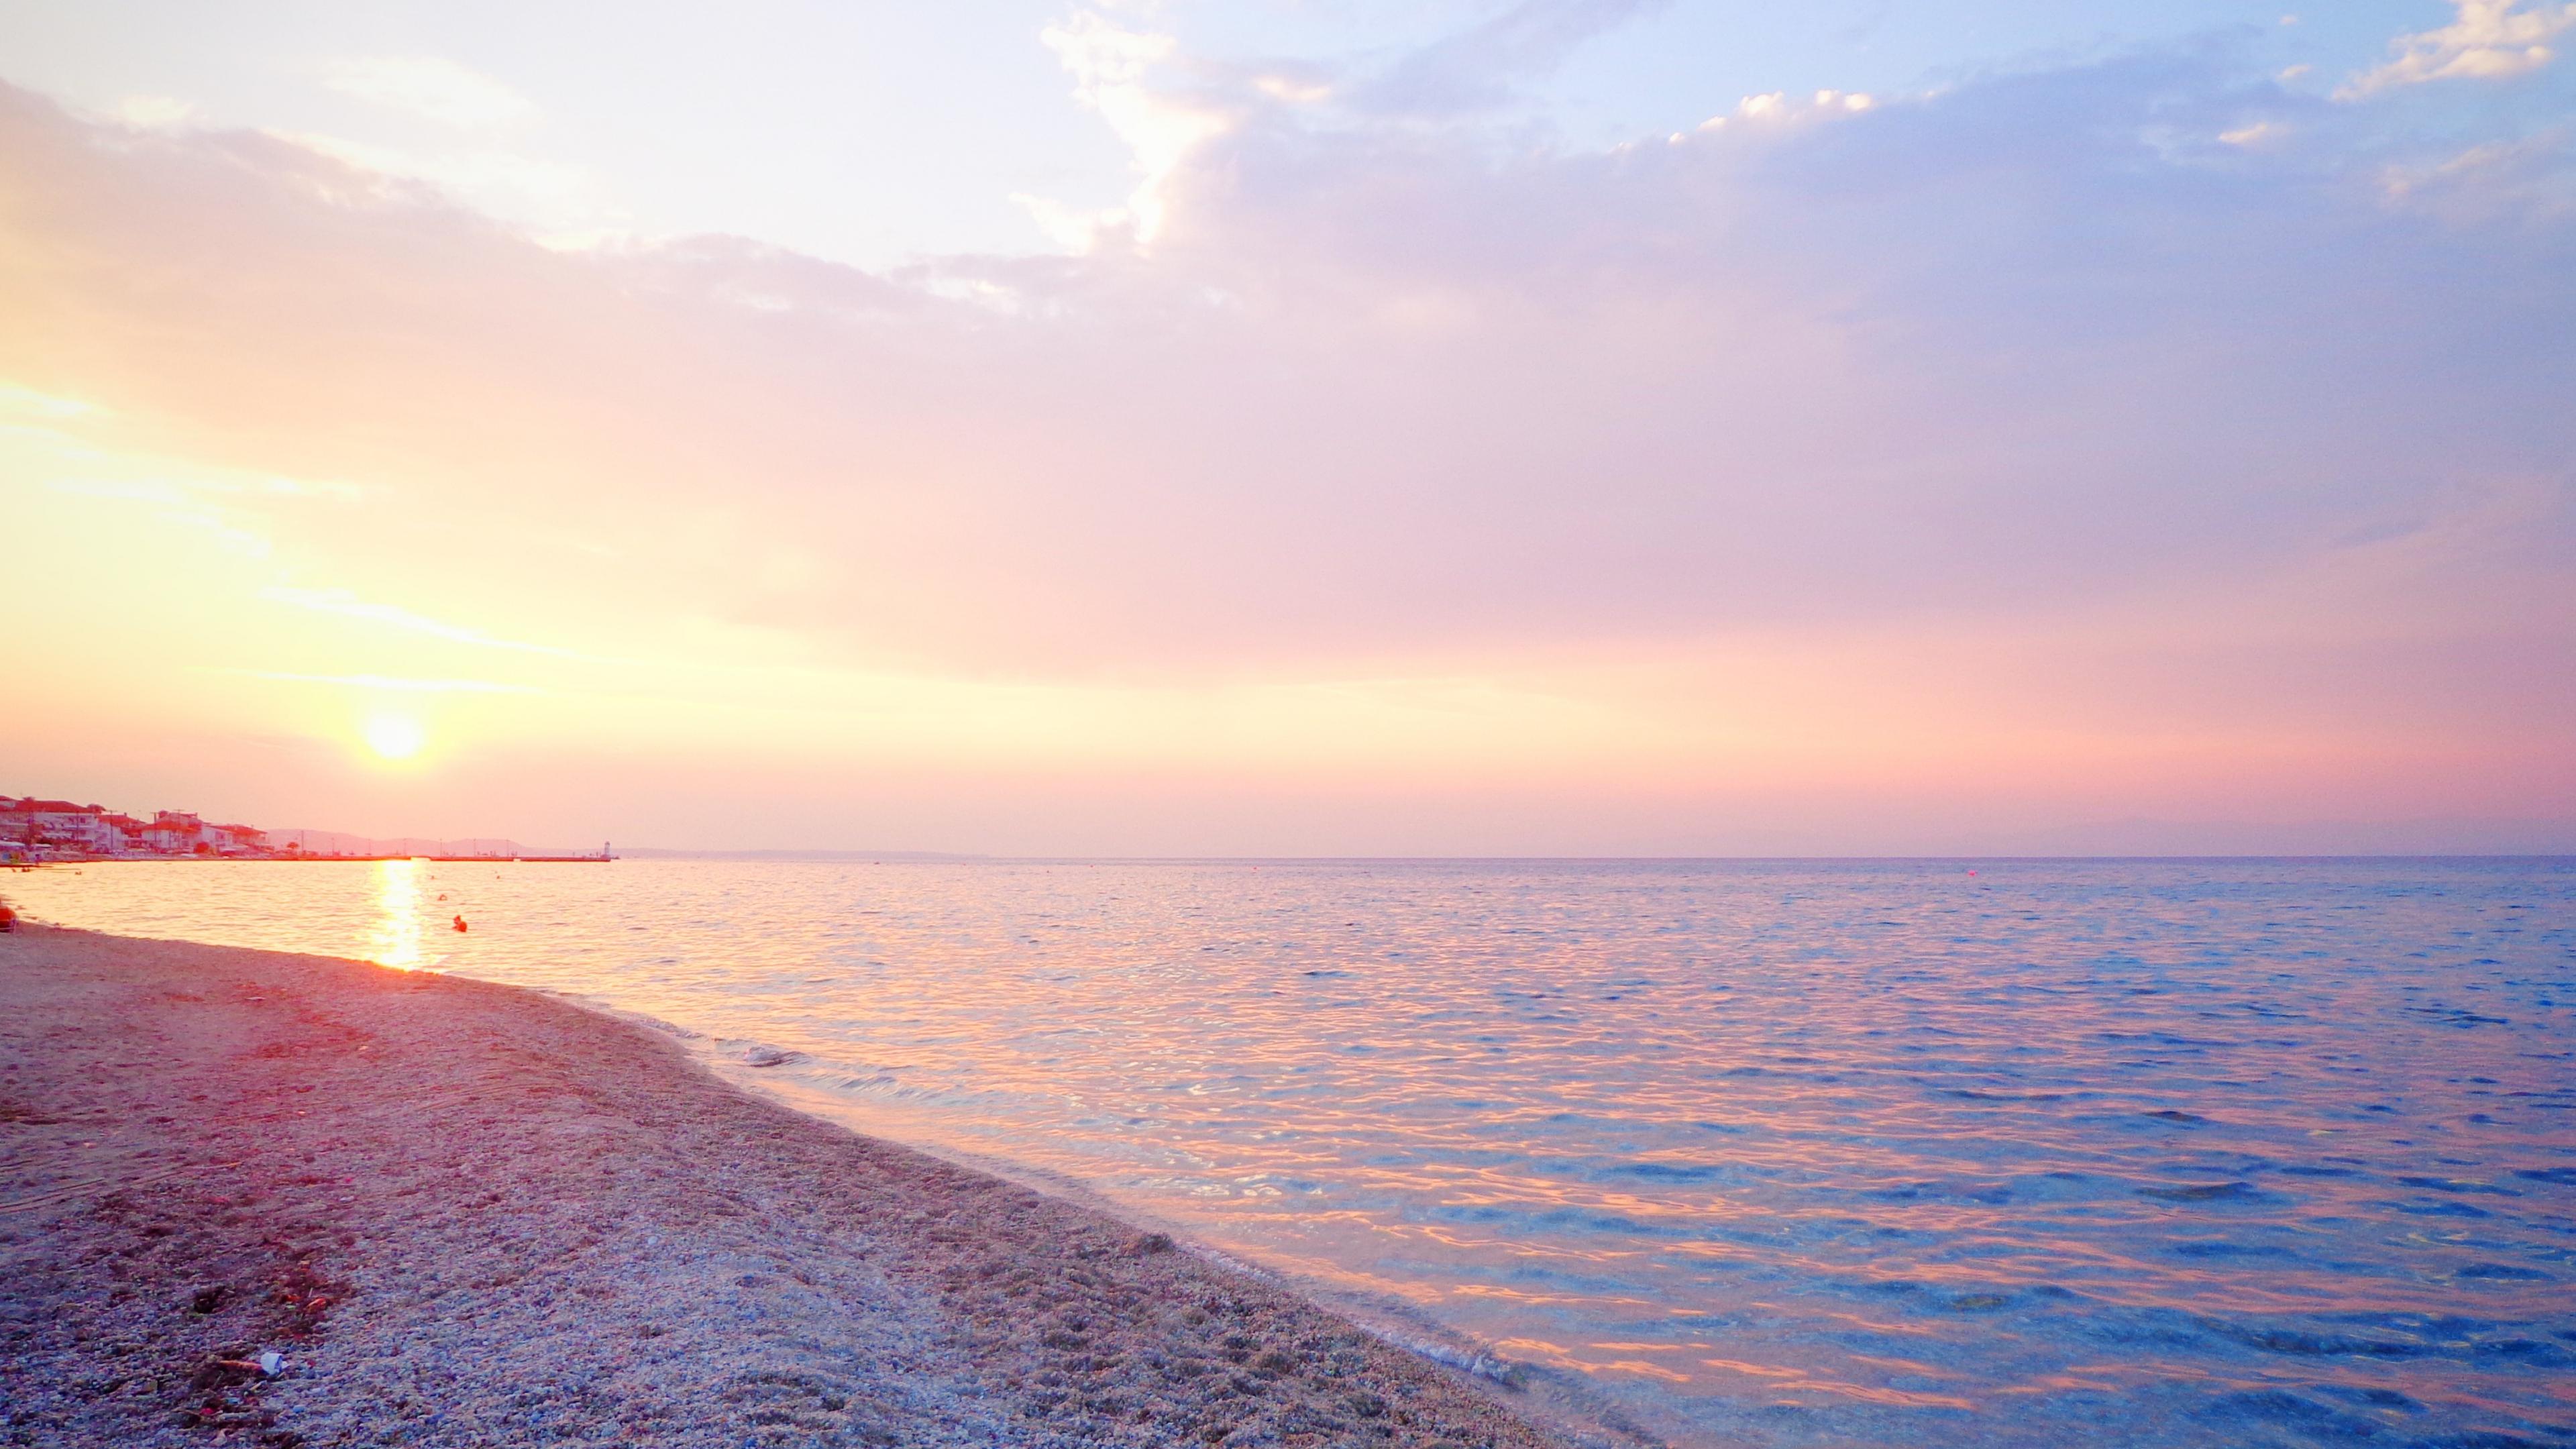 greece sea beach sunset 1535923878 - Greece Sea Beach Sunset - sunset wallpapers, sea wallpapers, nature wallpapers, beach wallpapers